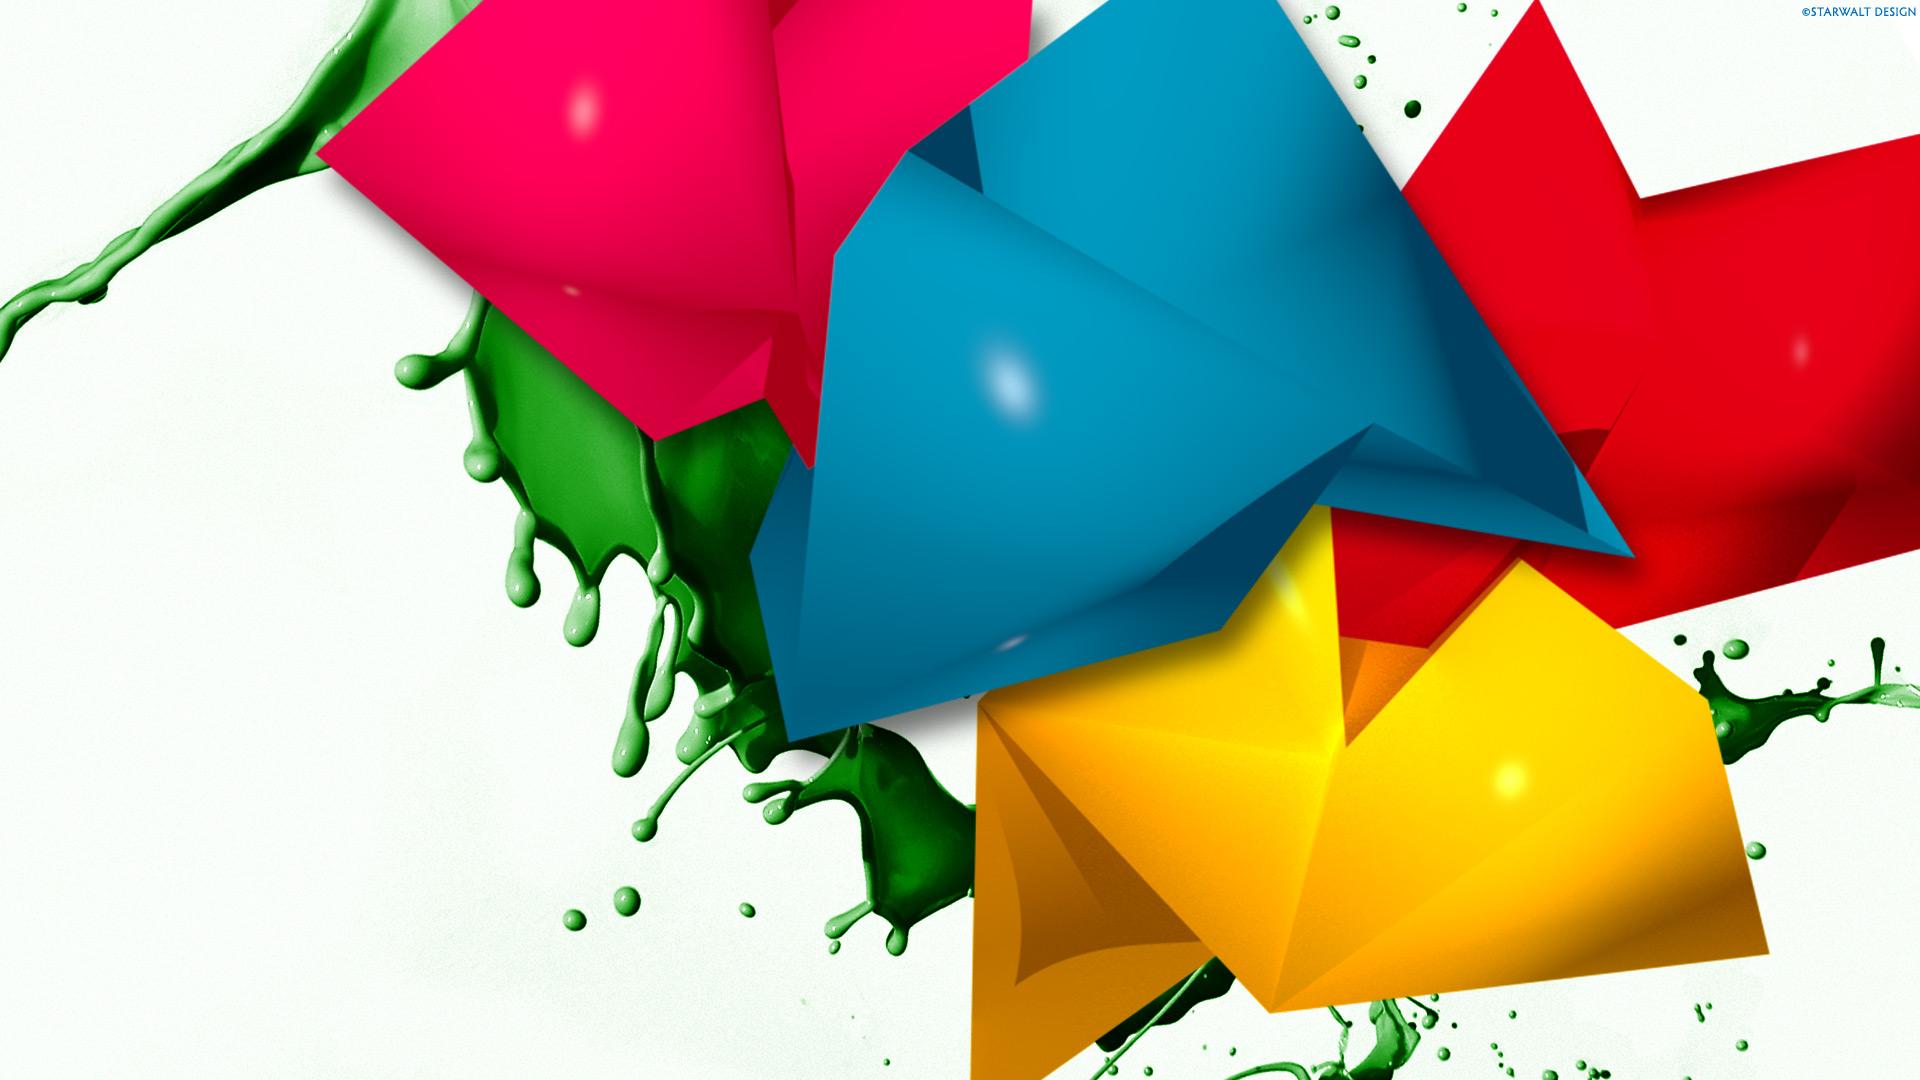 1920x1080 Abstracto Full Hd 1920x1080: 3D Full HD Fondo De Pantalla And Fondo De Escritorio